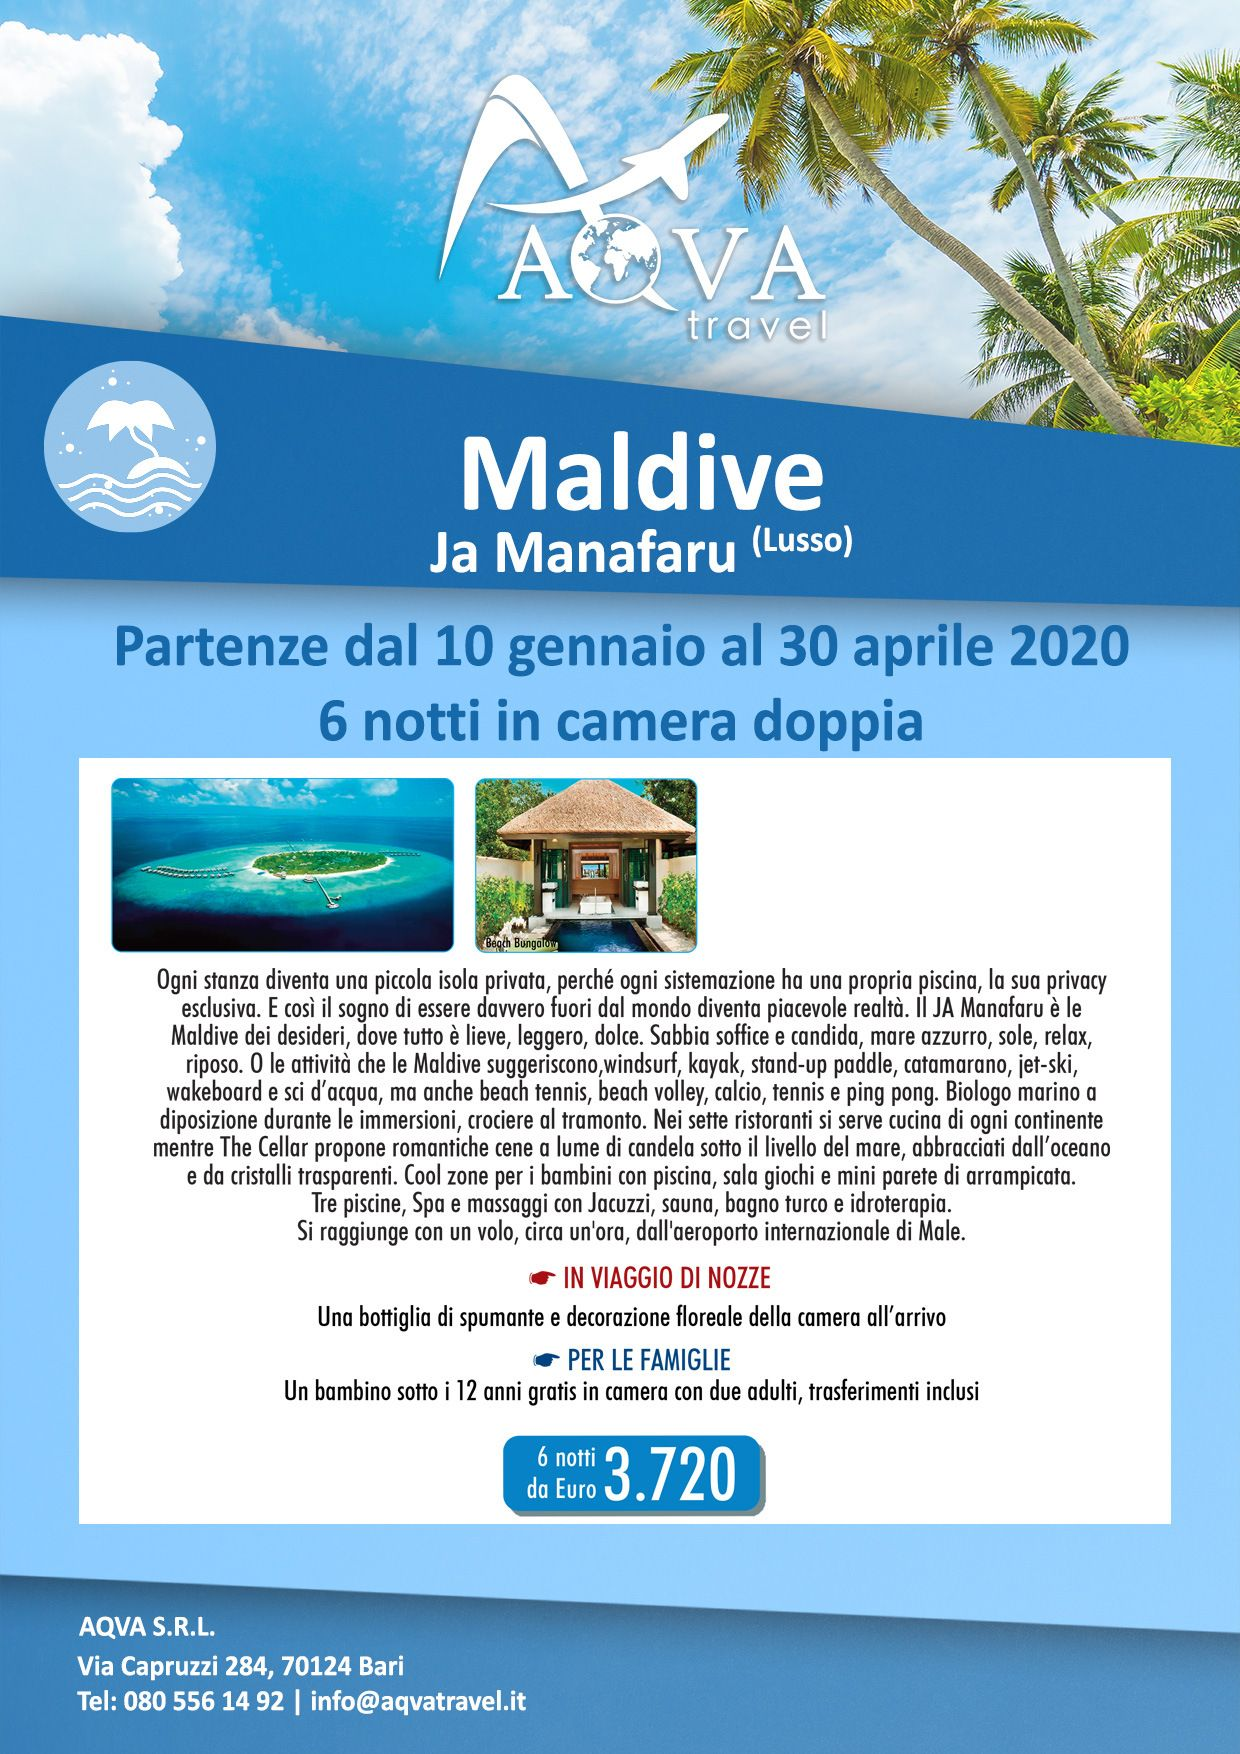 Maldive-Ja-Manafaru-offerte-agenzia-di-viaggi-Bari-AQVATRAVEL-it